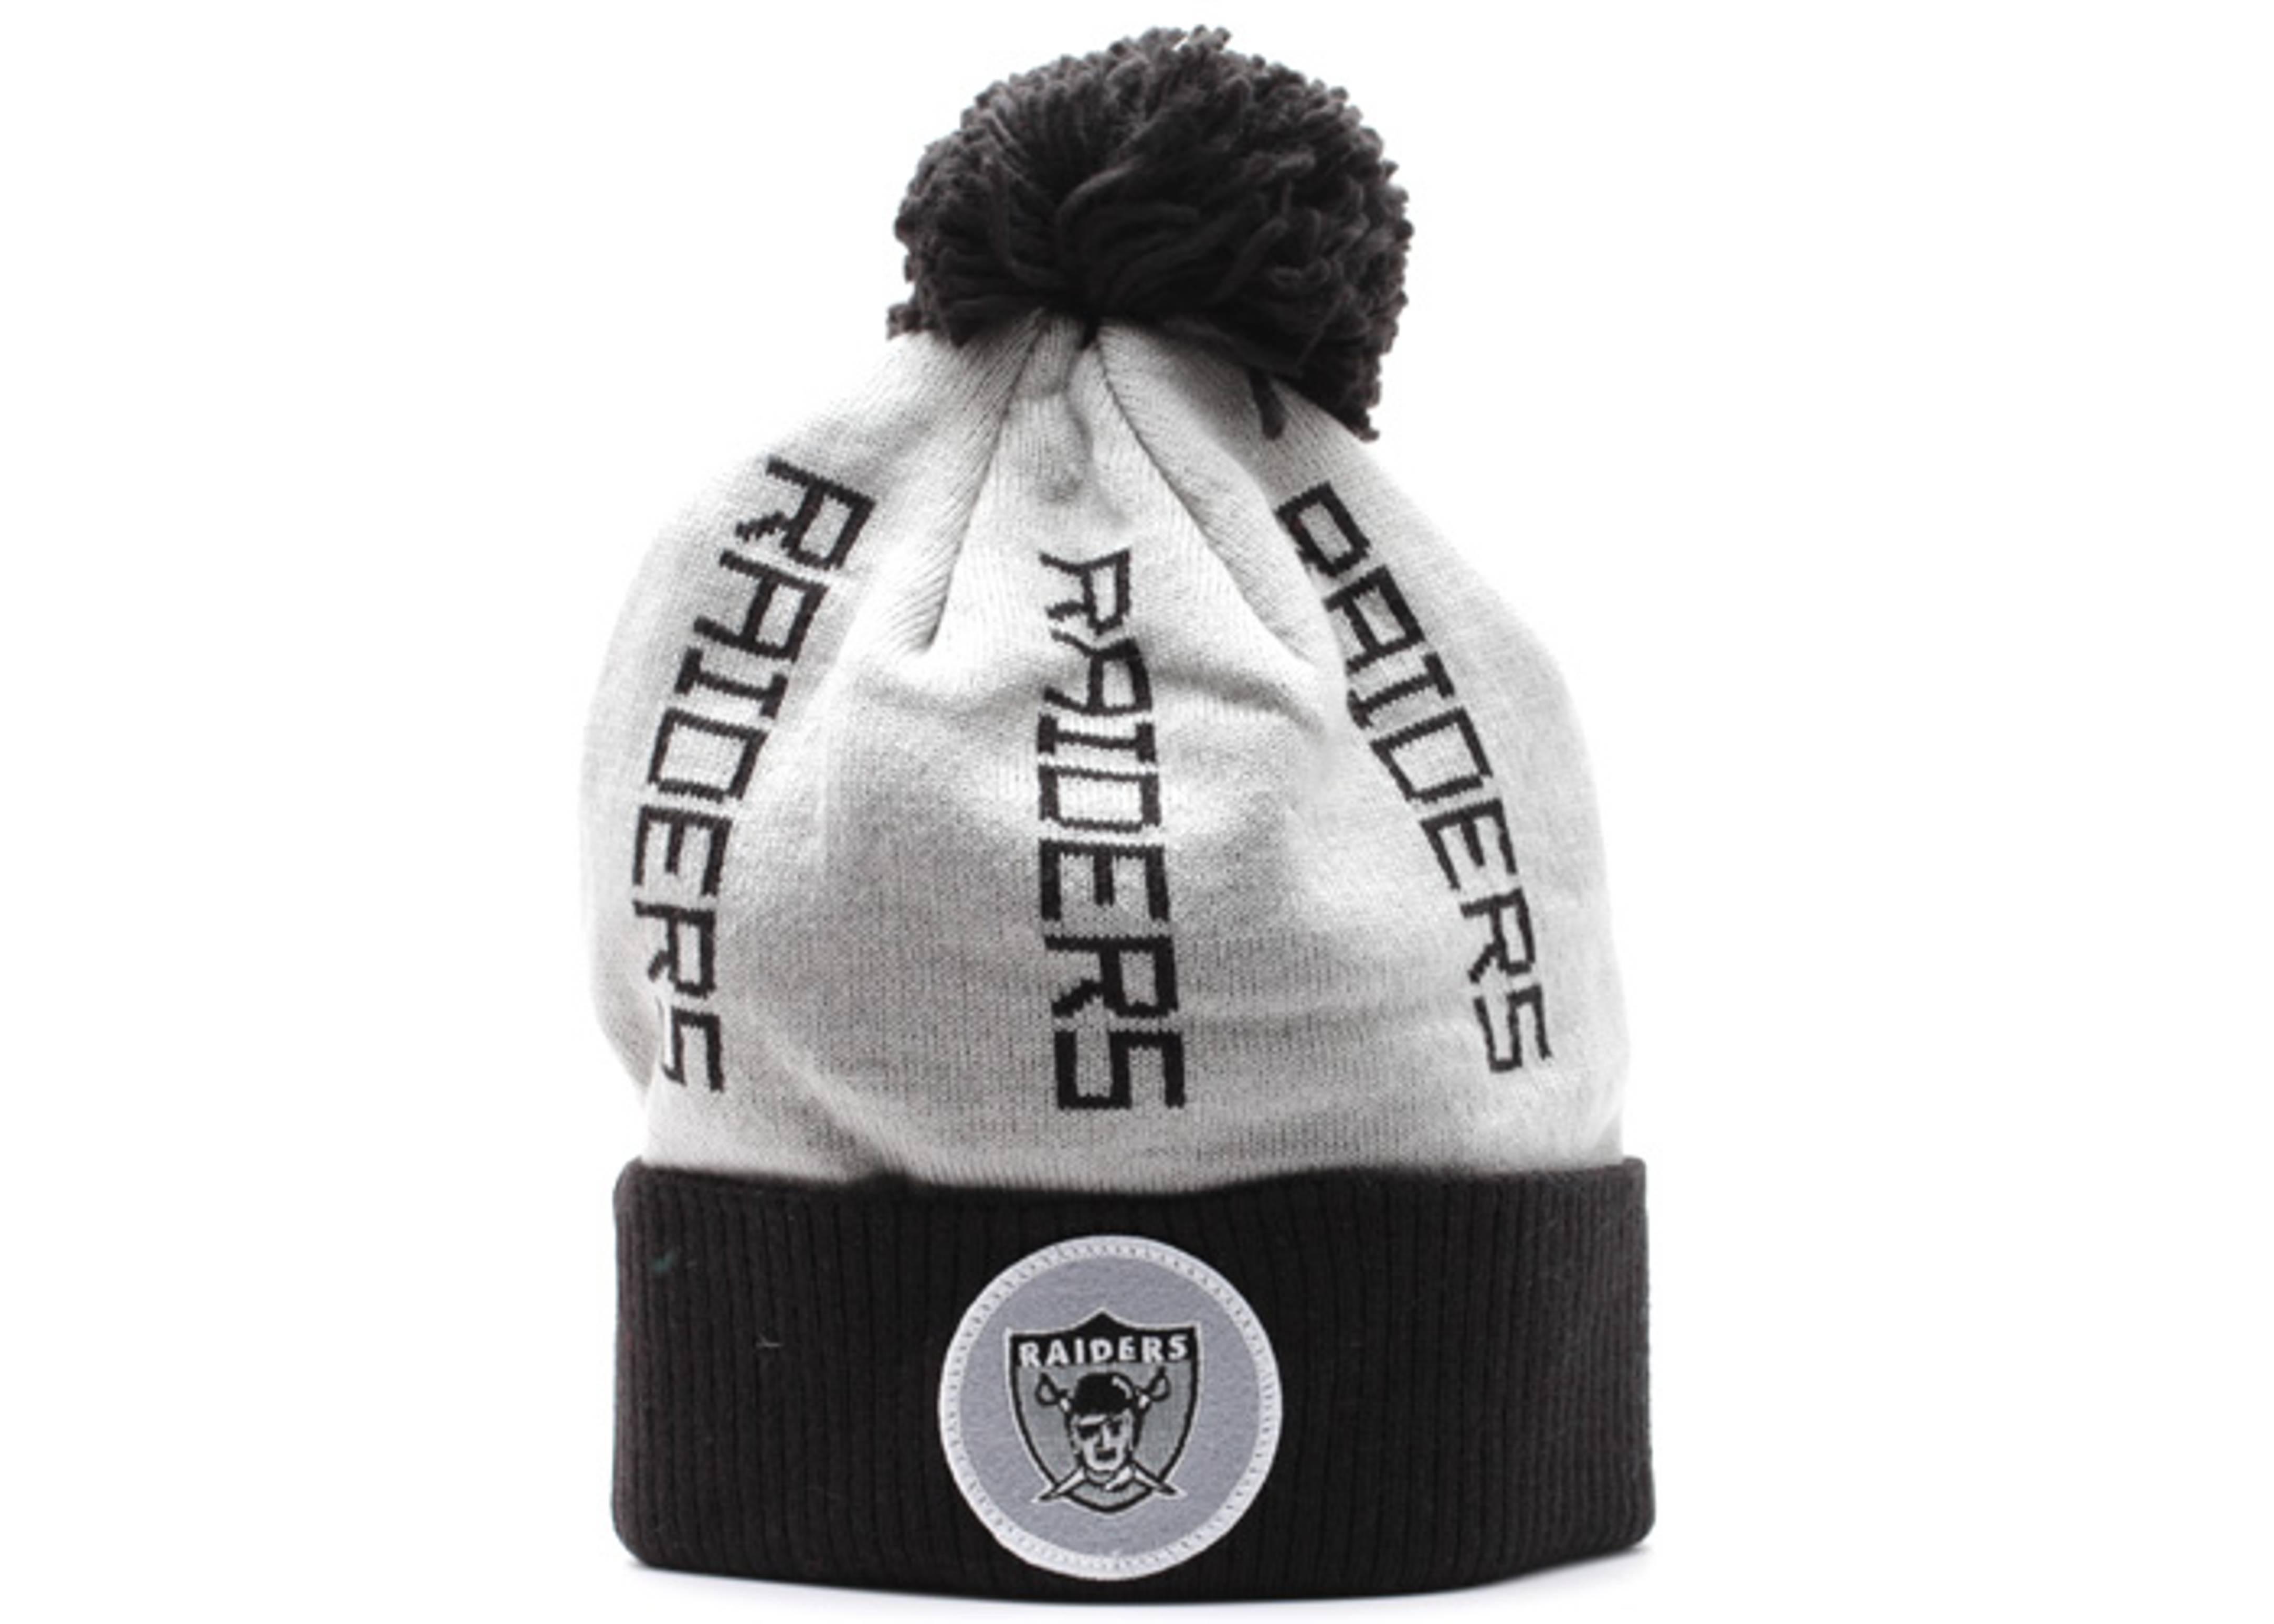 b4c2c80bebe4f Oakland Raiders Cuffed Pom Knit Beanie - Mitchell   Ness ...